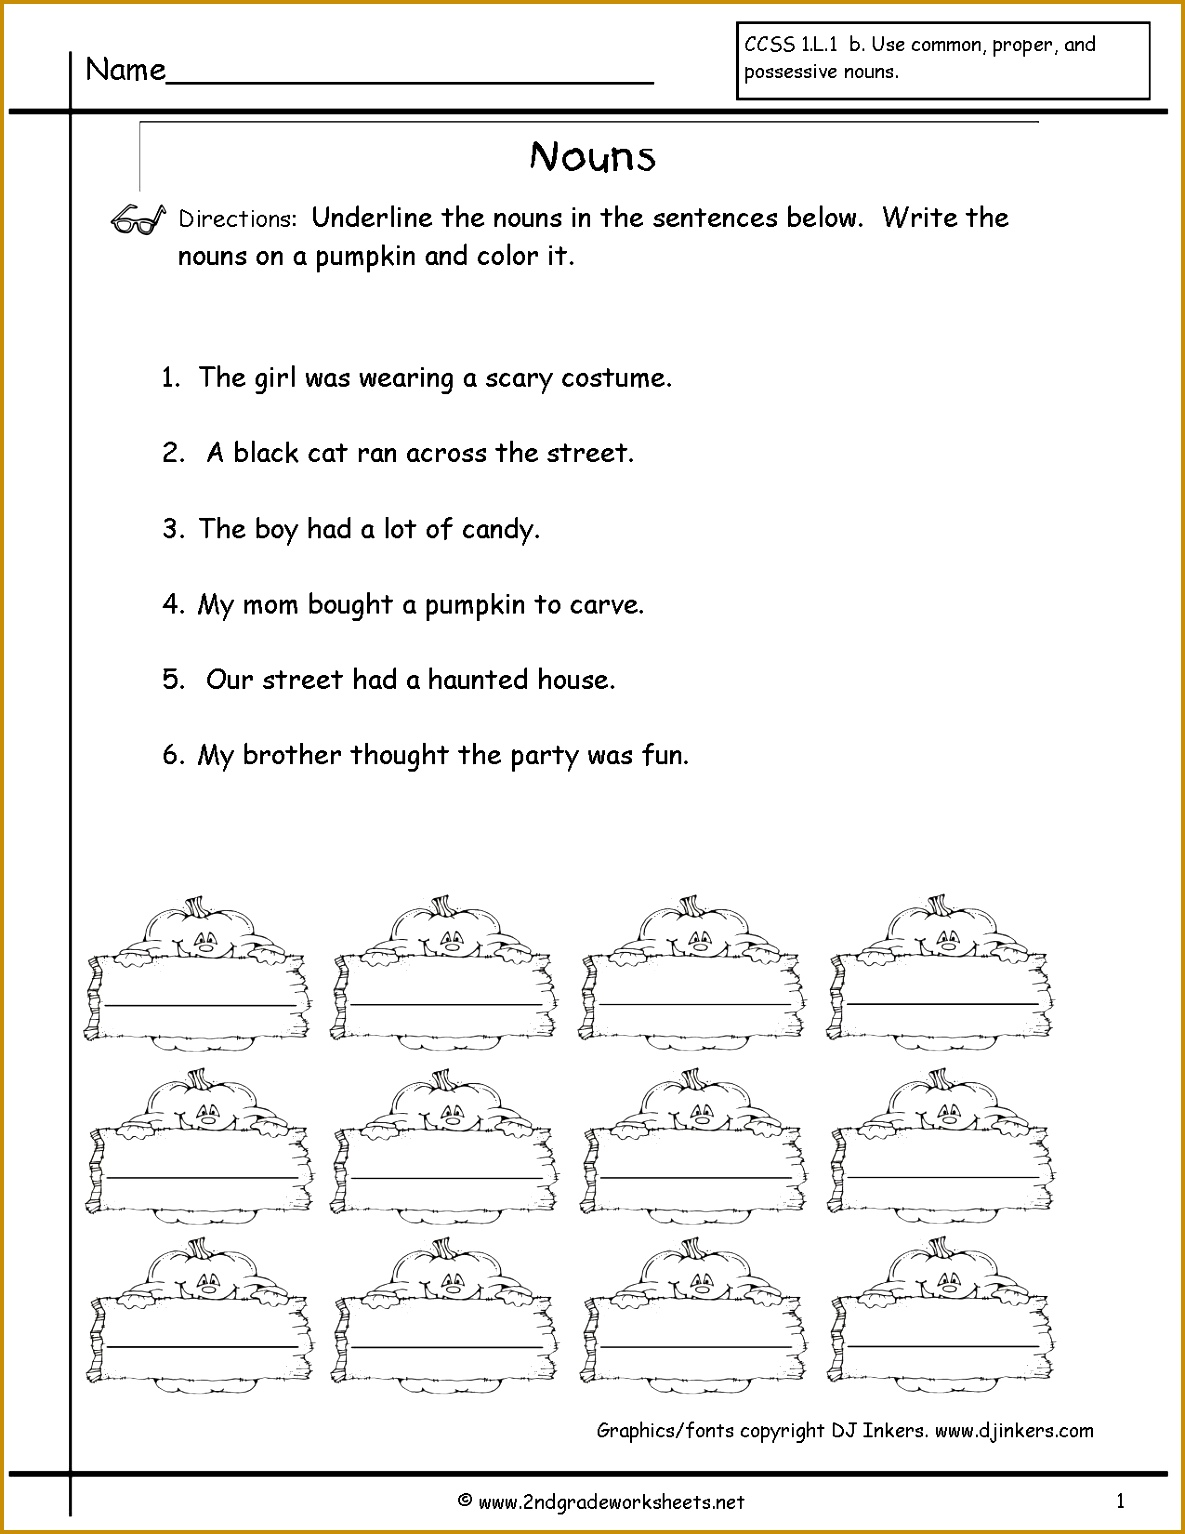 7 Possessive Nouns Worksheets